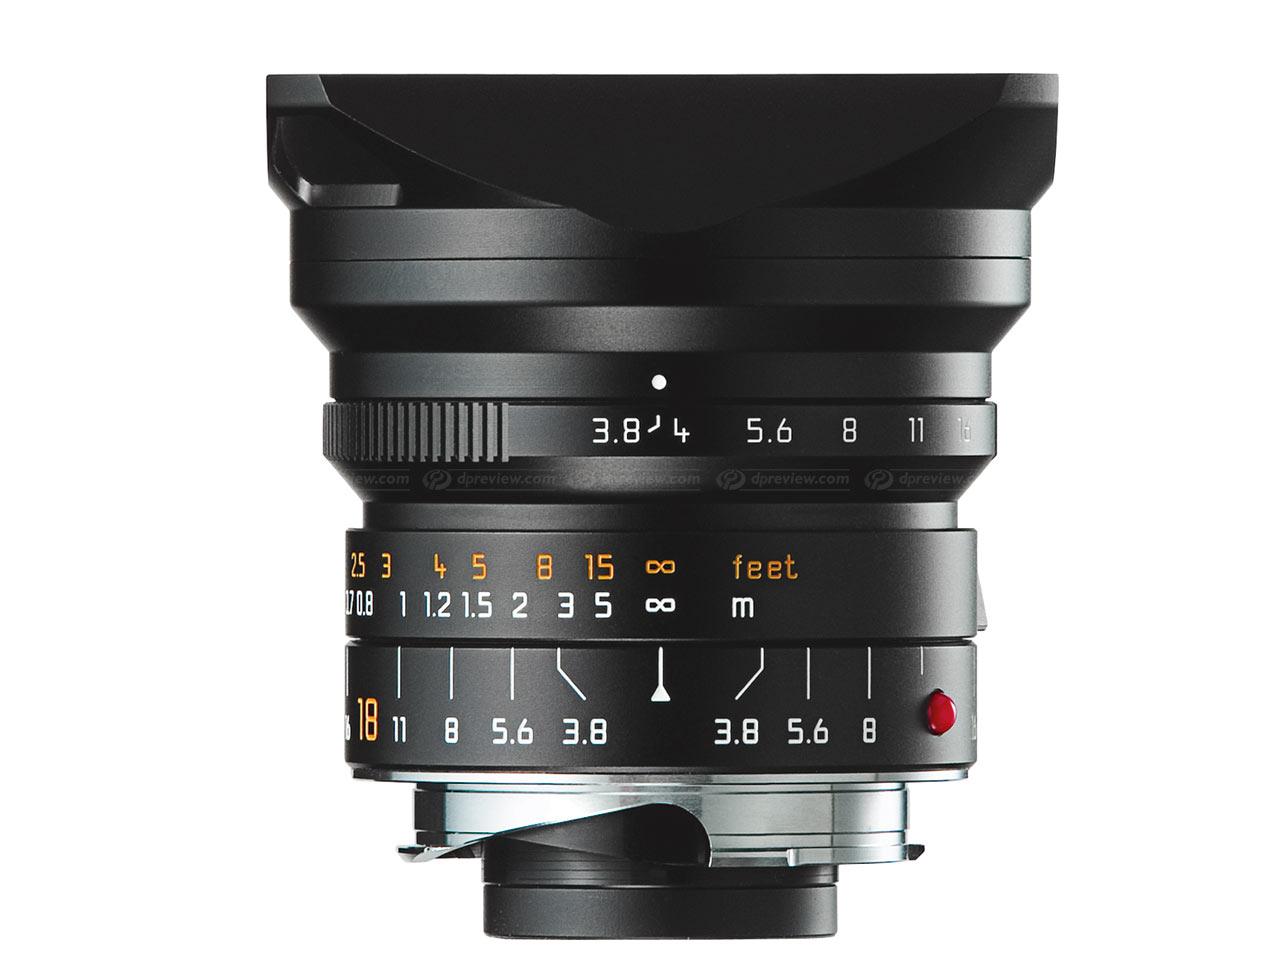 Pre-PMA 209: Leica выпустила объектив Super-Elmar-M 18 мм f/ 3,8 ASPH